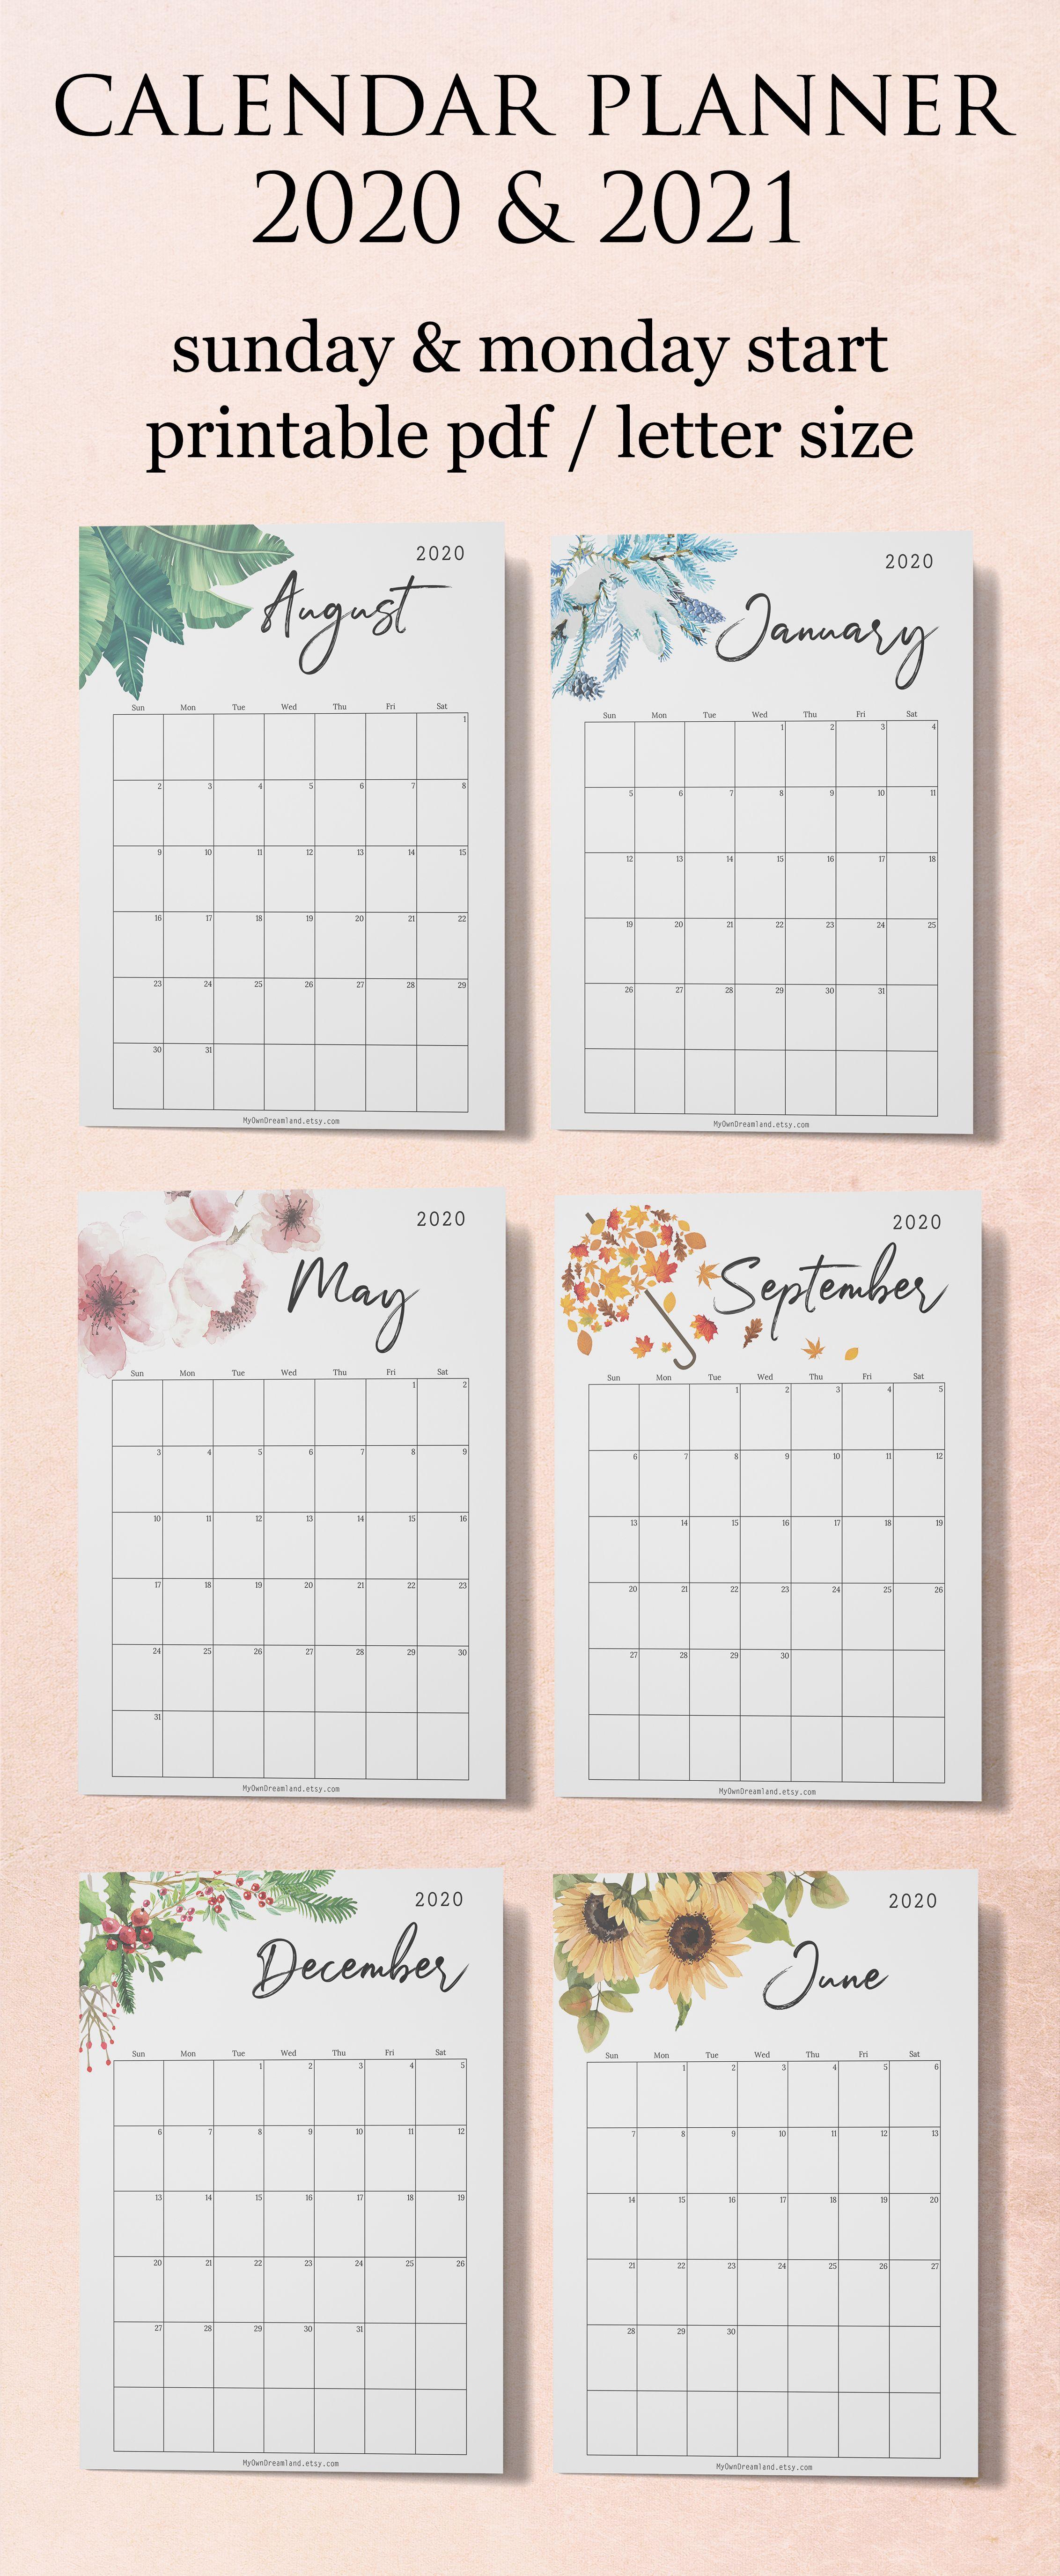 Calendar 2020 Printable Calendar Planner 2020 Monthly Etsy In 2020 Planner Calendar Printables Planner Calendar Planner